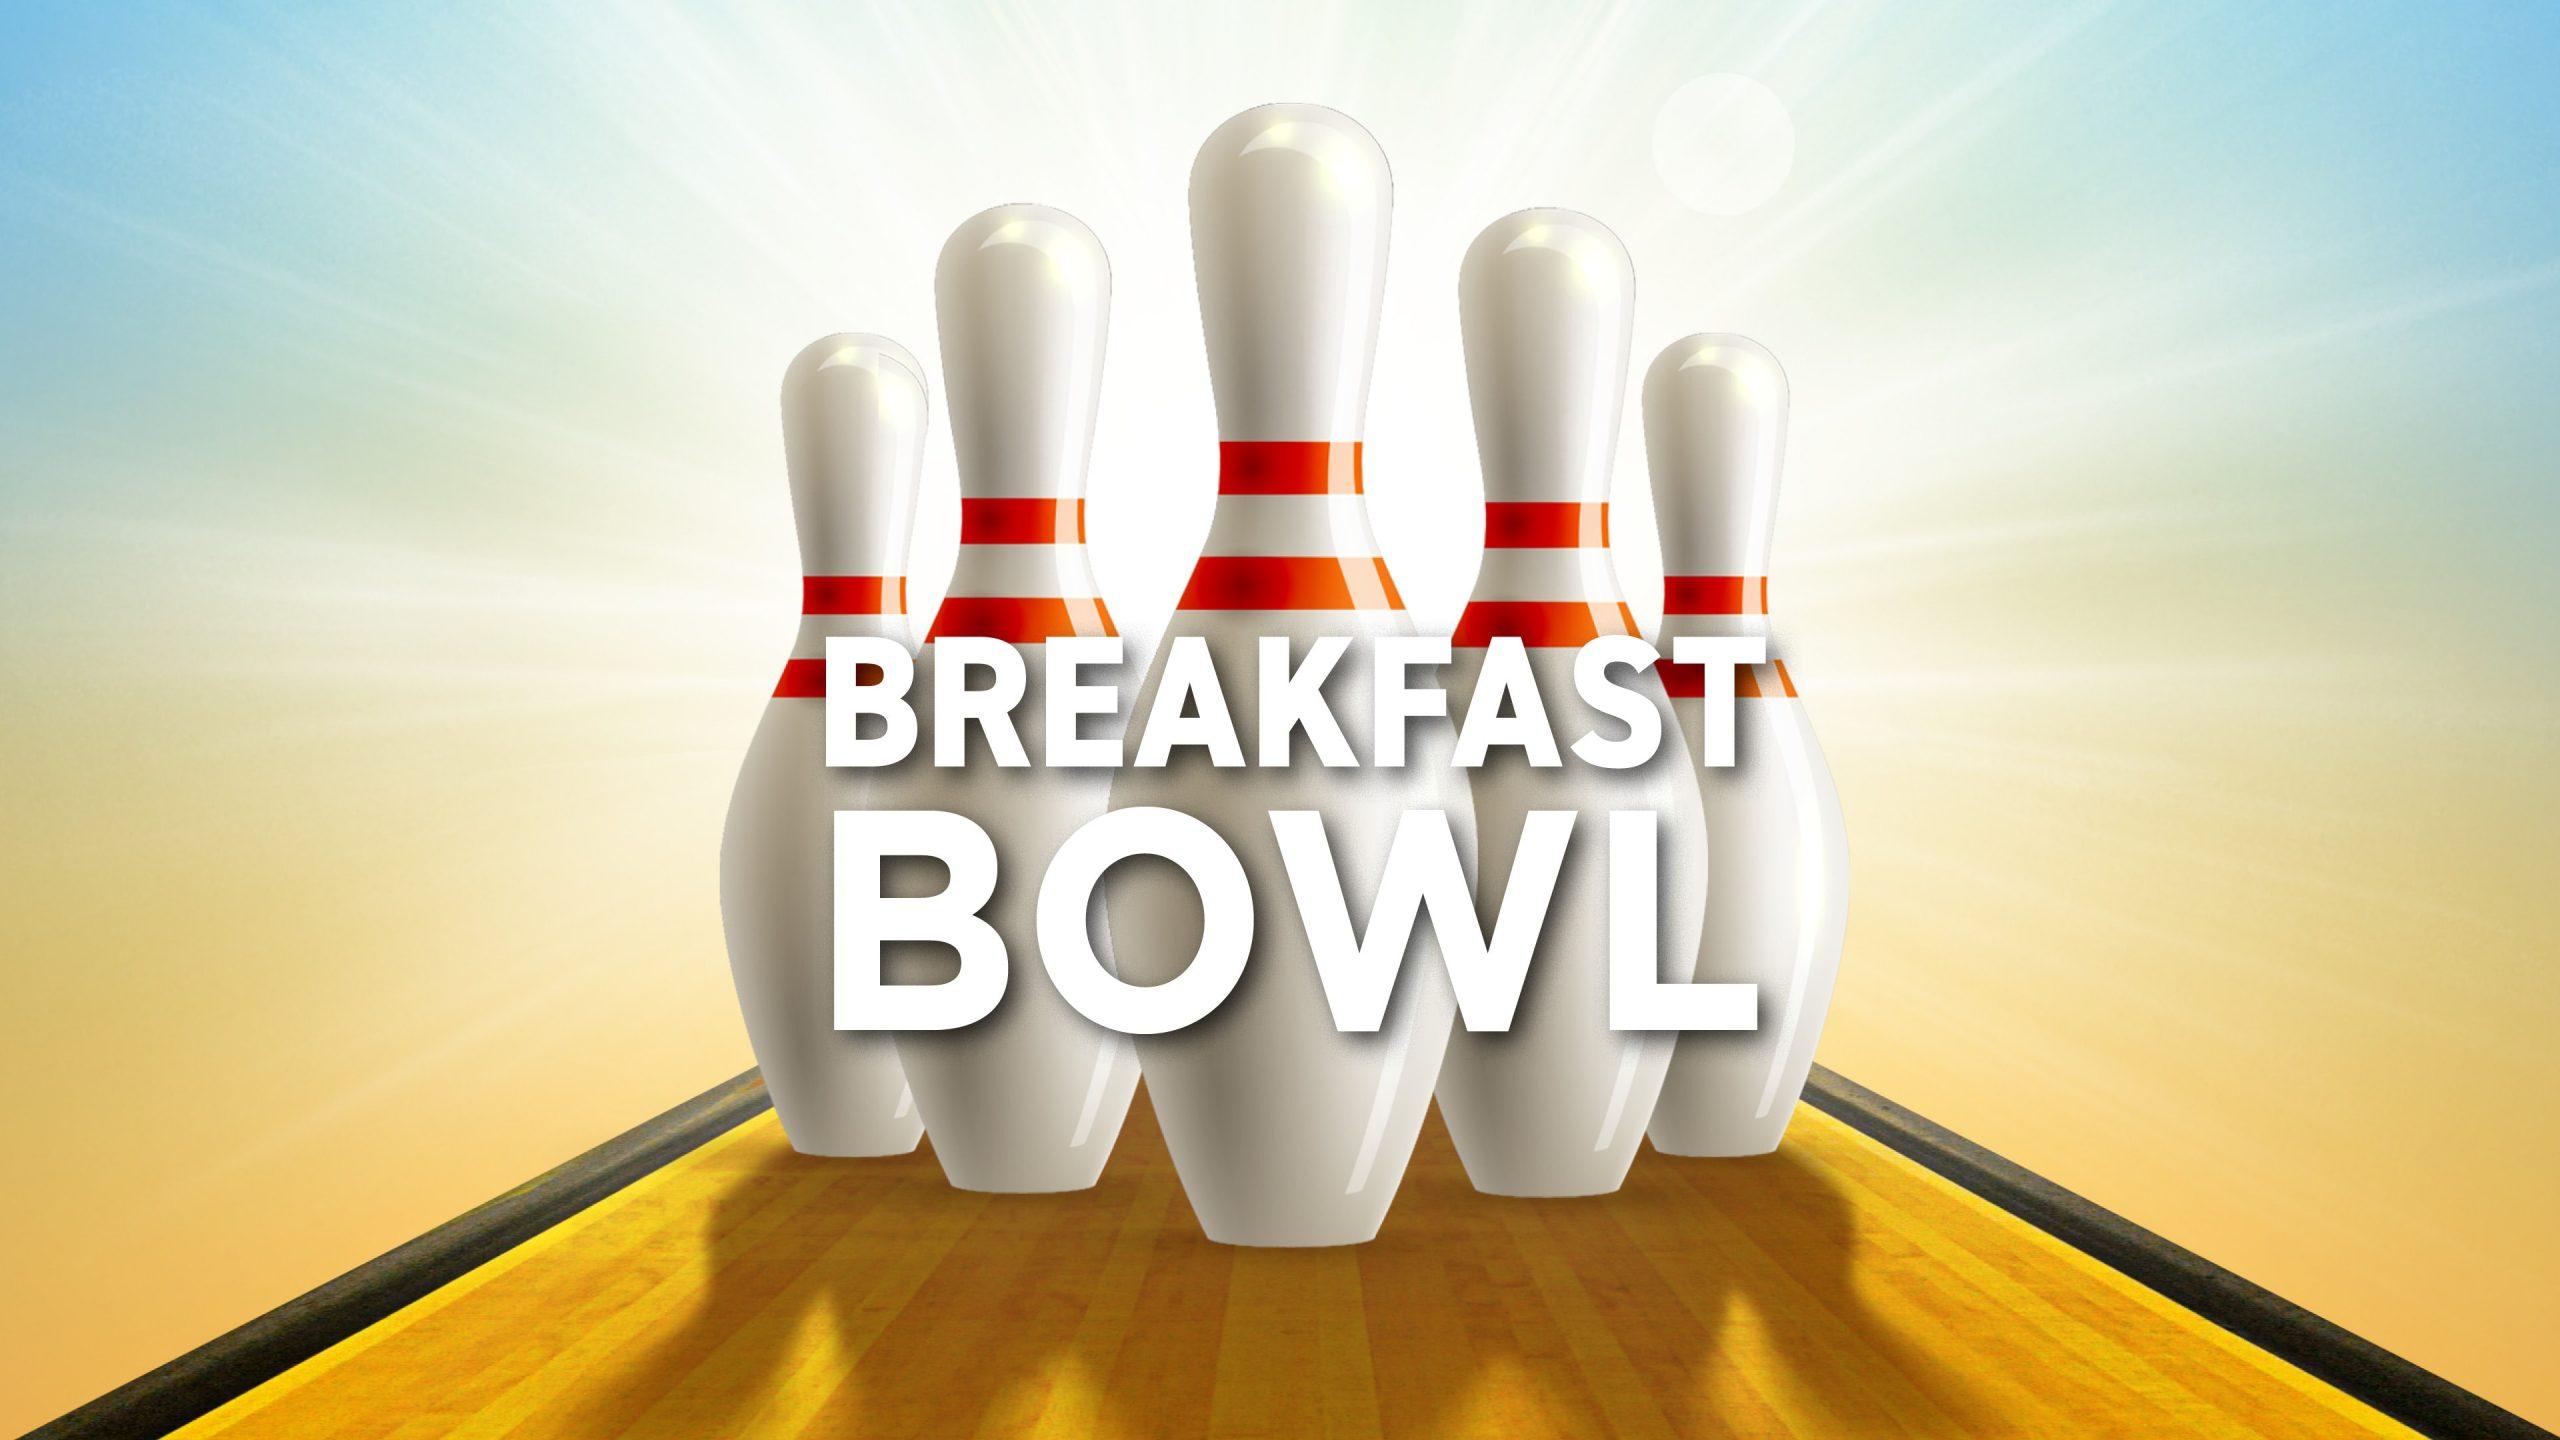 Sunday Breakfast Bowl